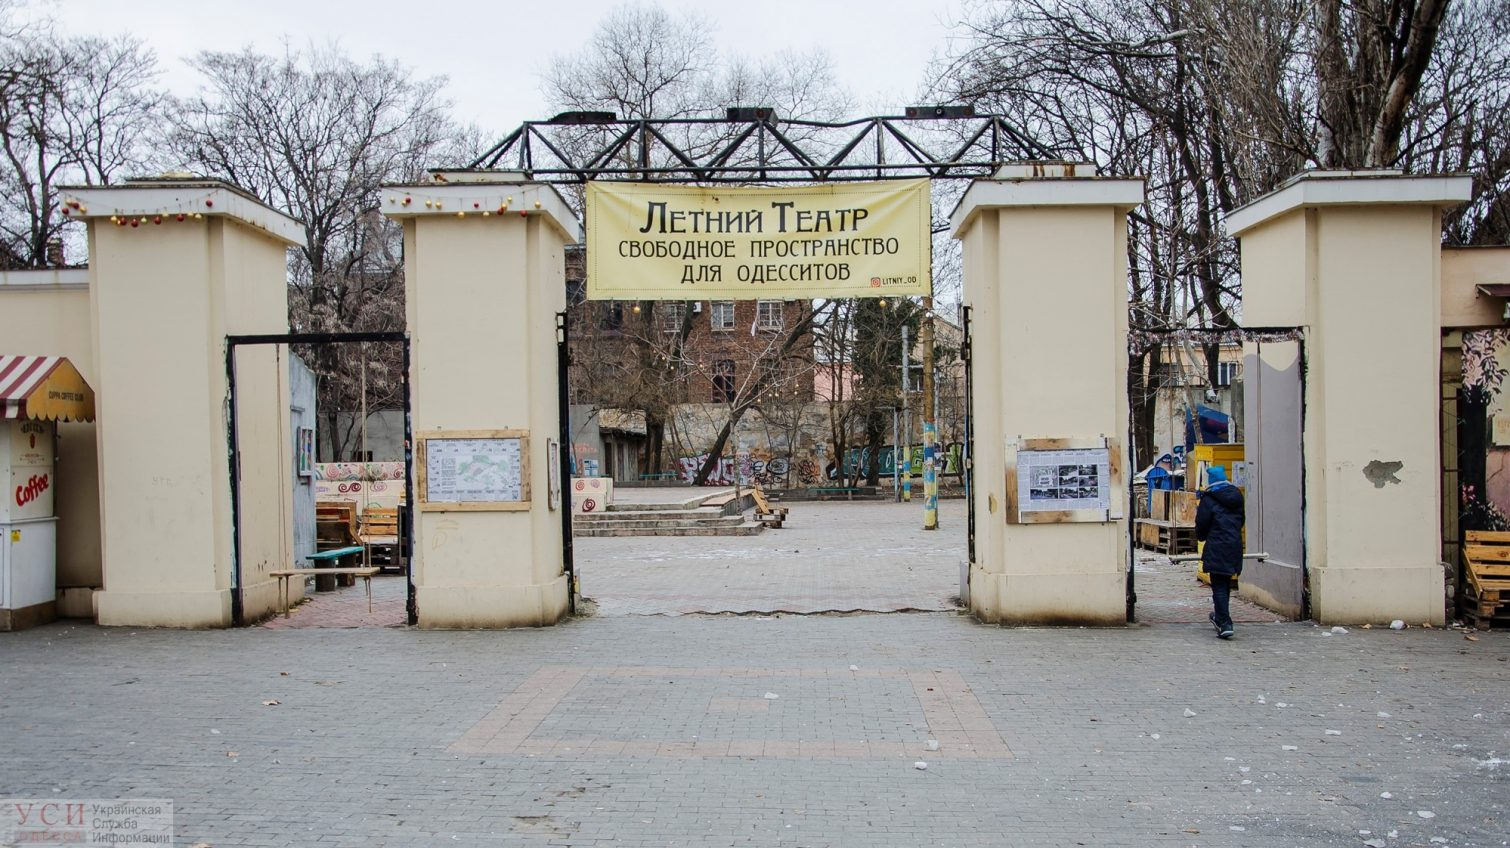 Борьба за Летний театр: еще один активист выиграл суд у «Солинга» «фото»